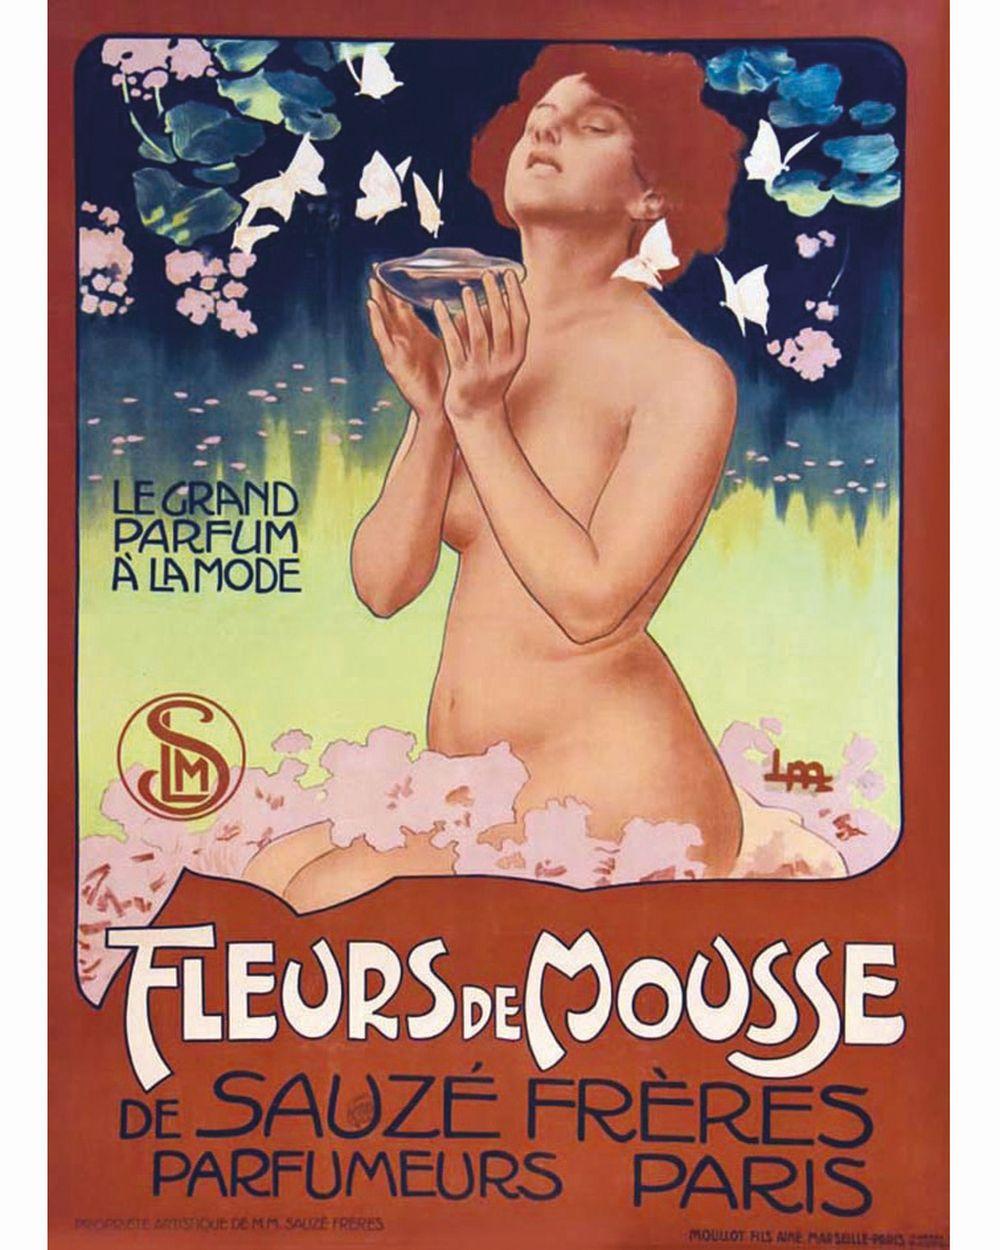 METLIKOVITZ LEOPOLDO - Fleurs de Mousse Sauzé Parfumeurs     vers 1900